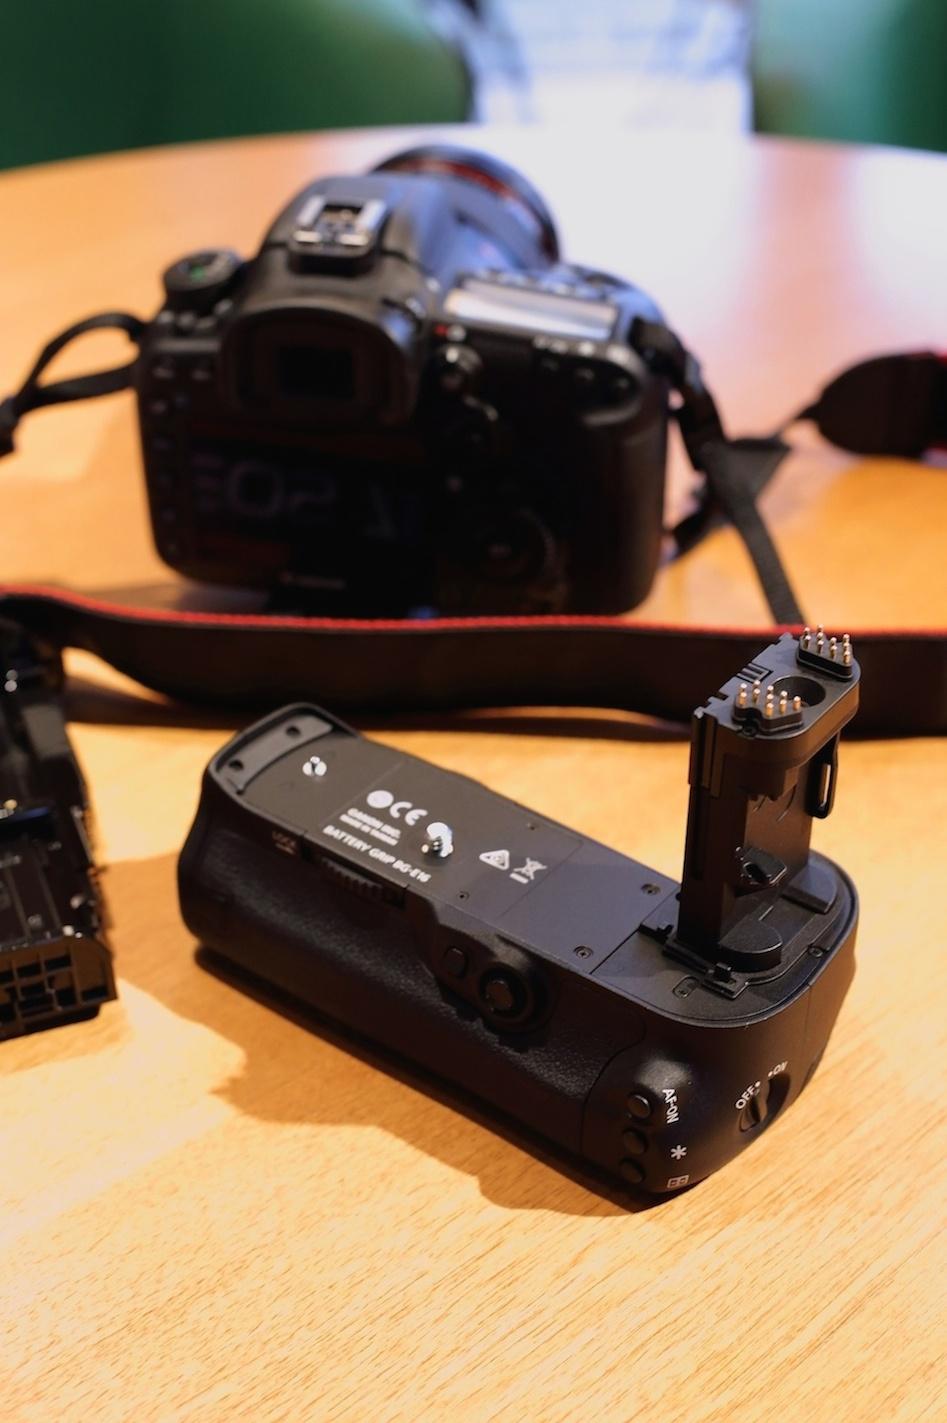 Canon EOS 7D Mark II GET BG(バッテリーグリップ)キャンペーン_d0081605_14331942.jpg